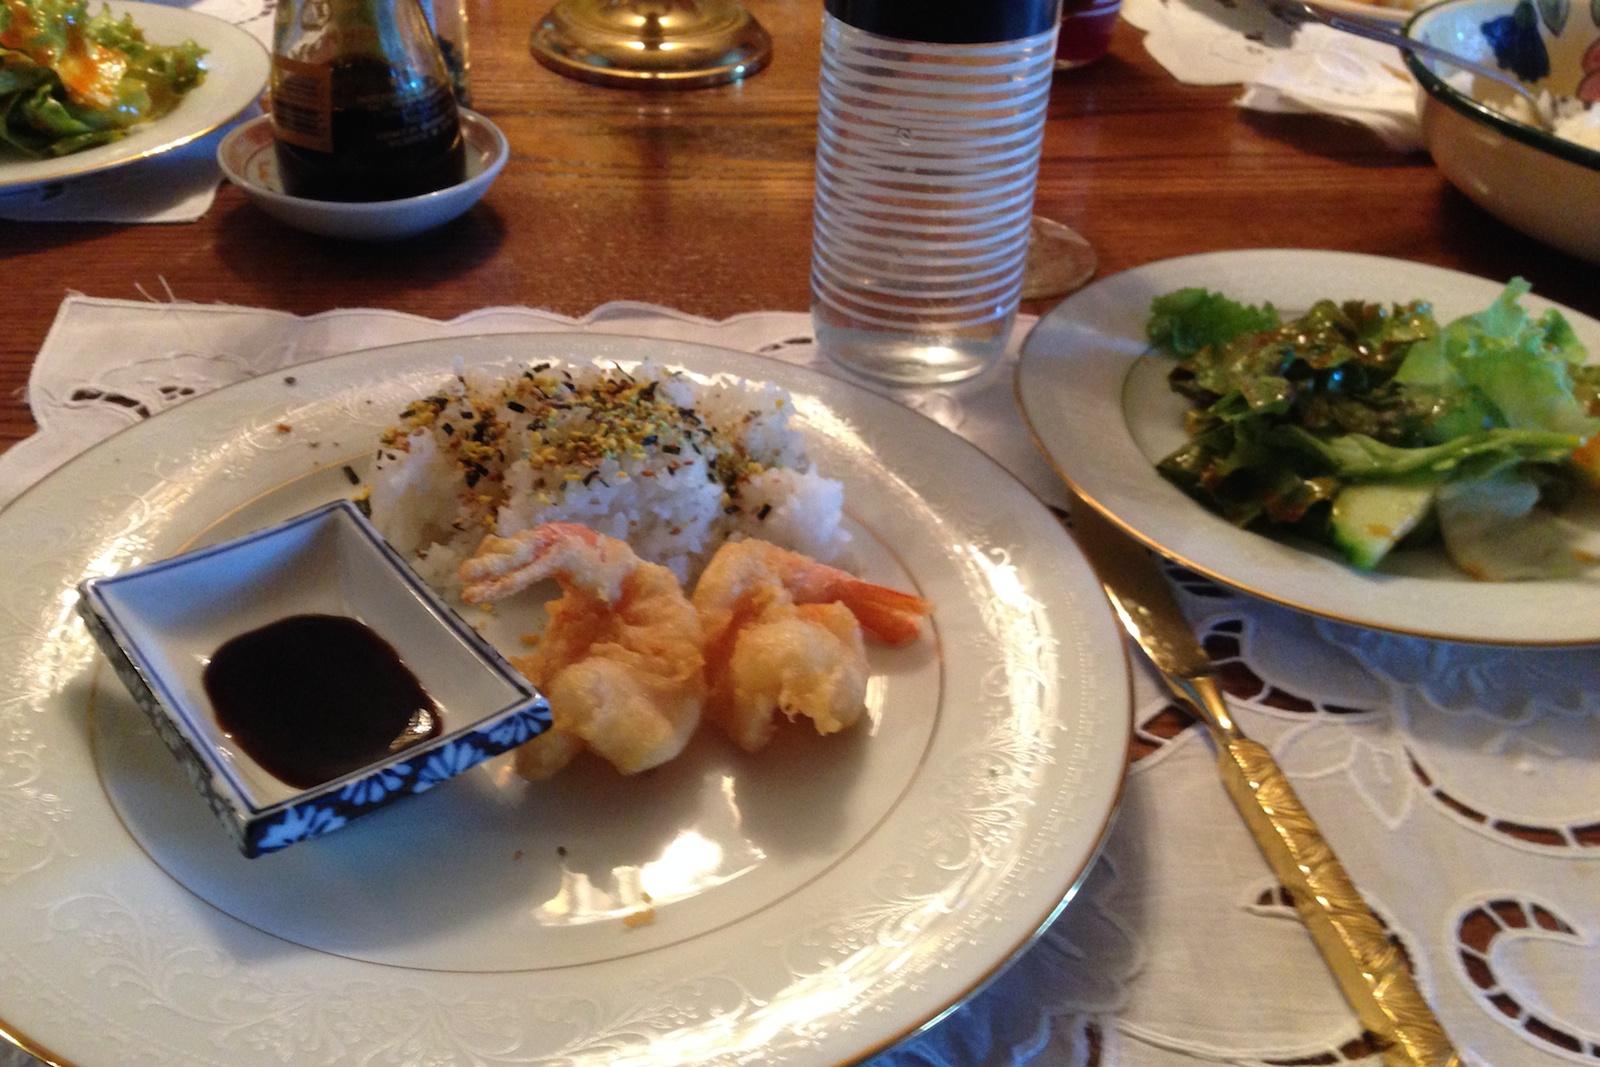 http://blog.rickk.com/food/2014/08/28/ate.2014.08.28.d.jpg